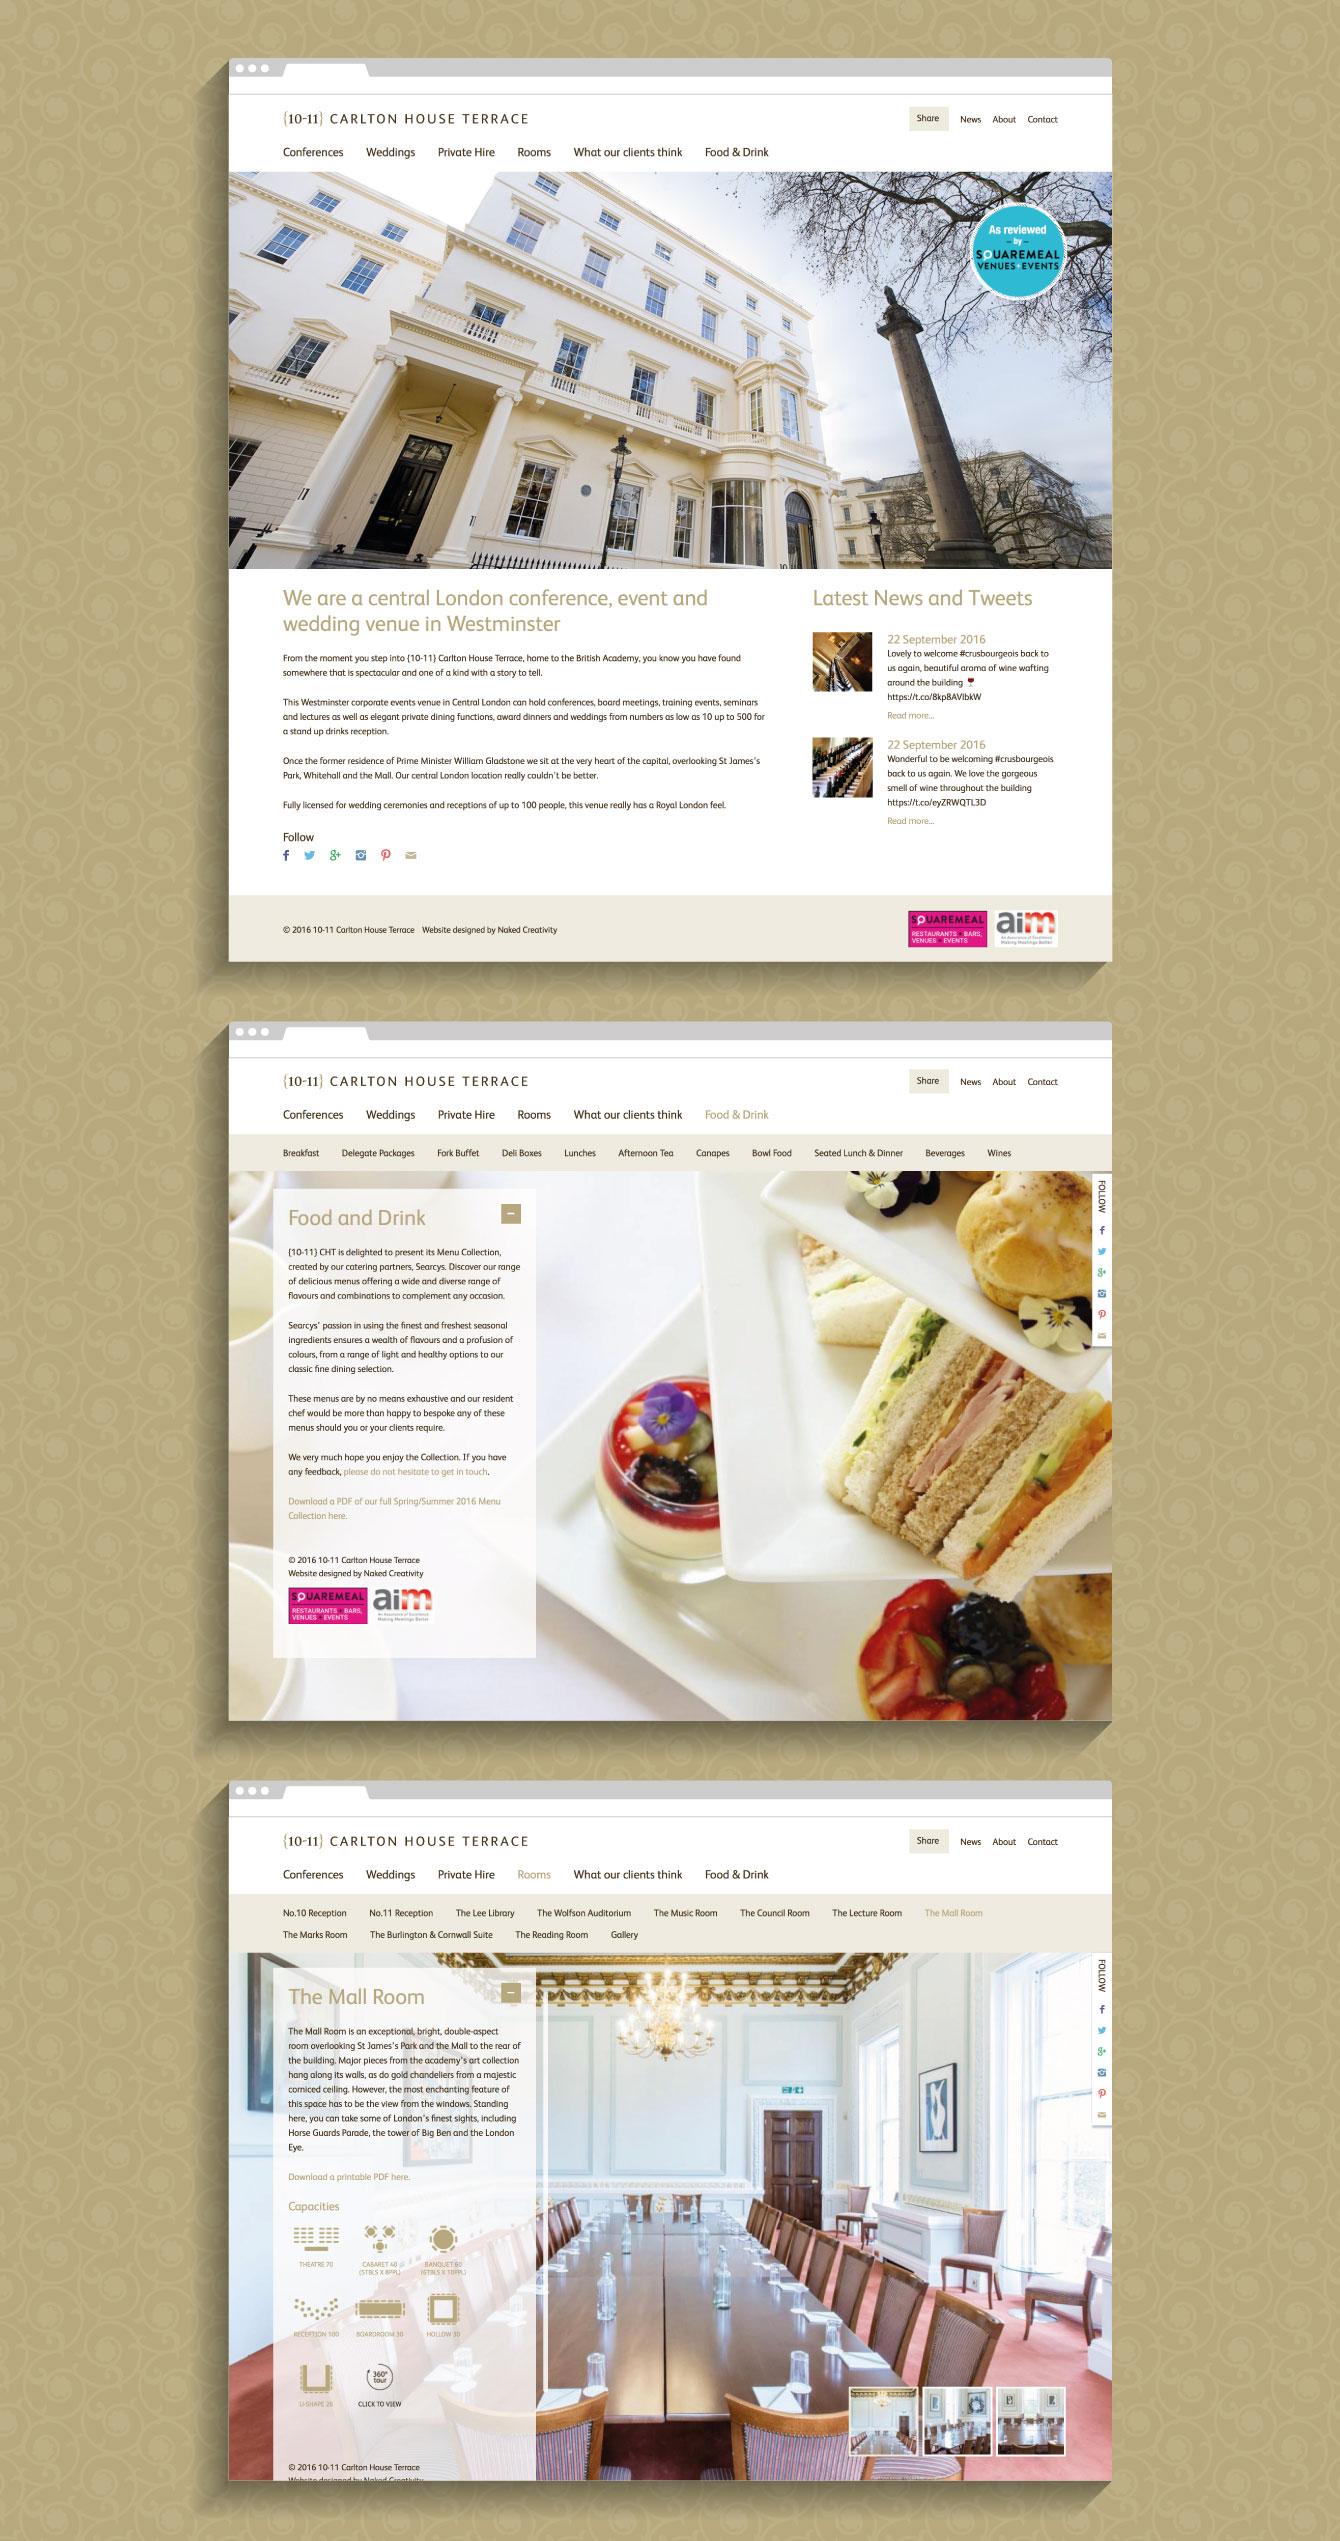 The 10-11 Carlton House Terrace website - desktop